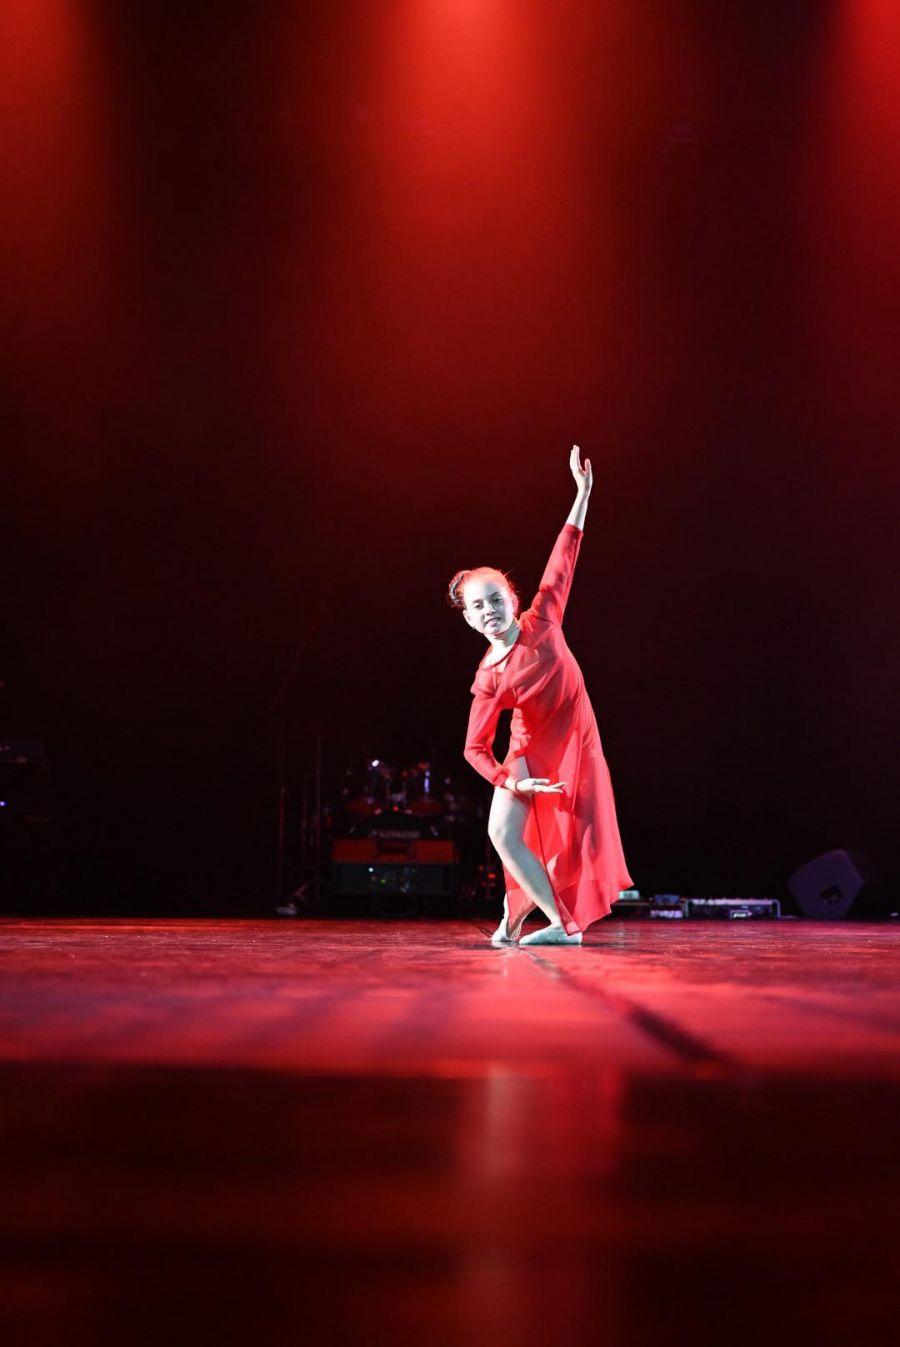 Tükörvilág – Gálaestet tartott a Princess Balettiskola